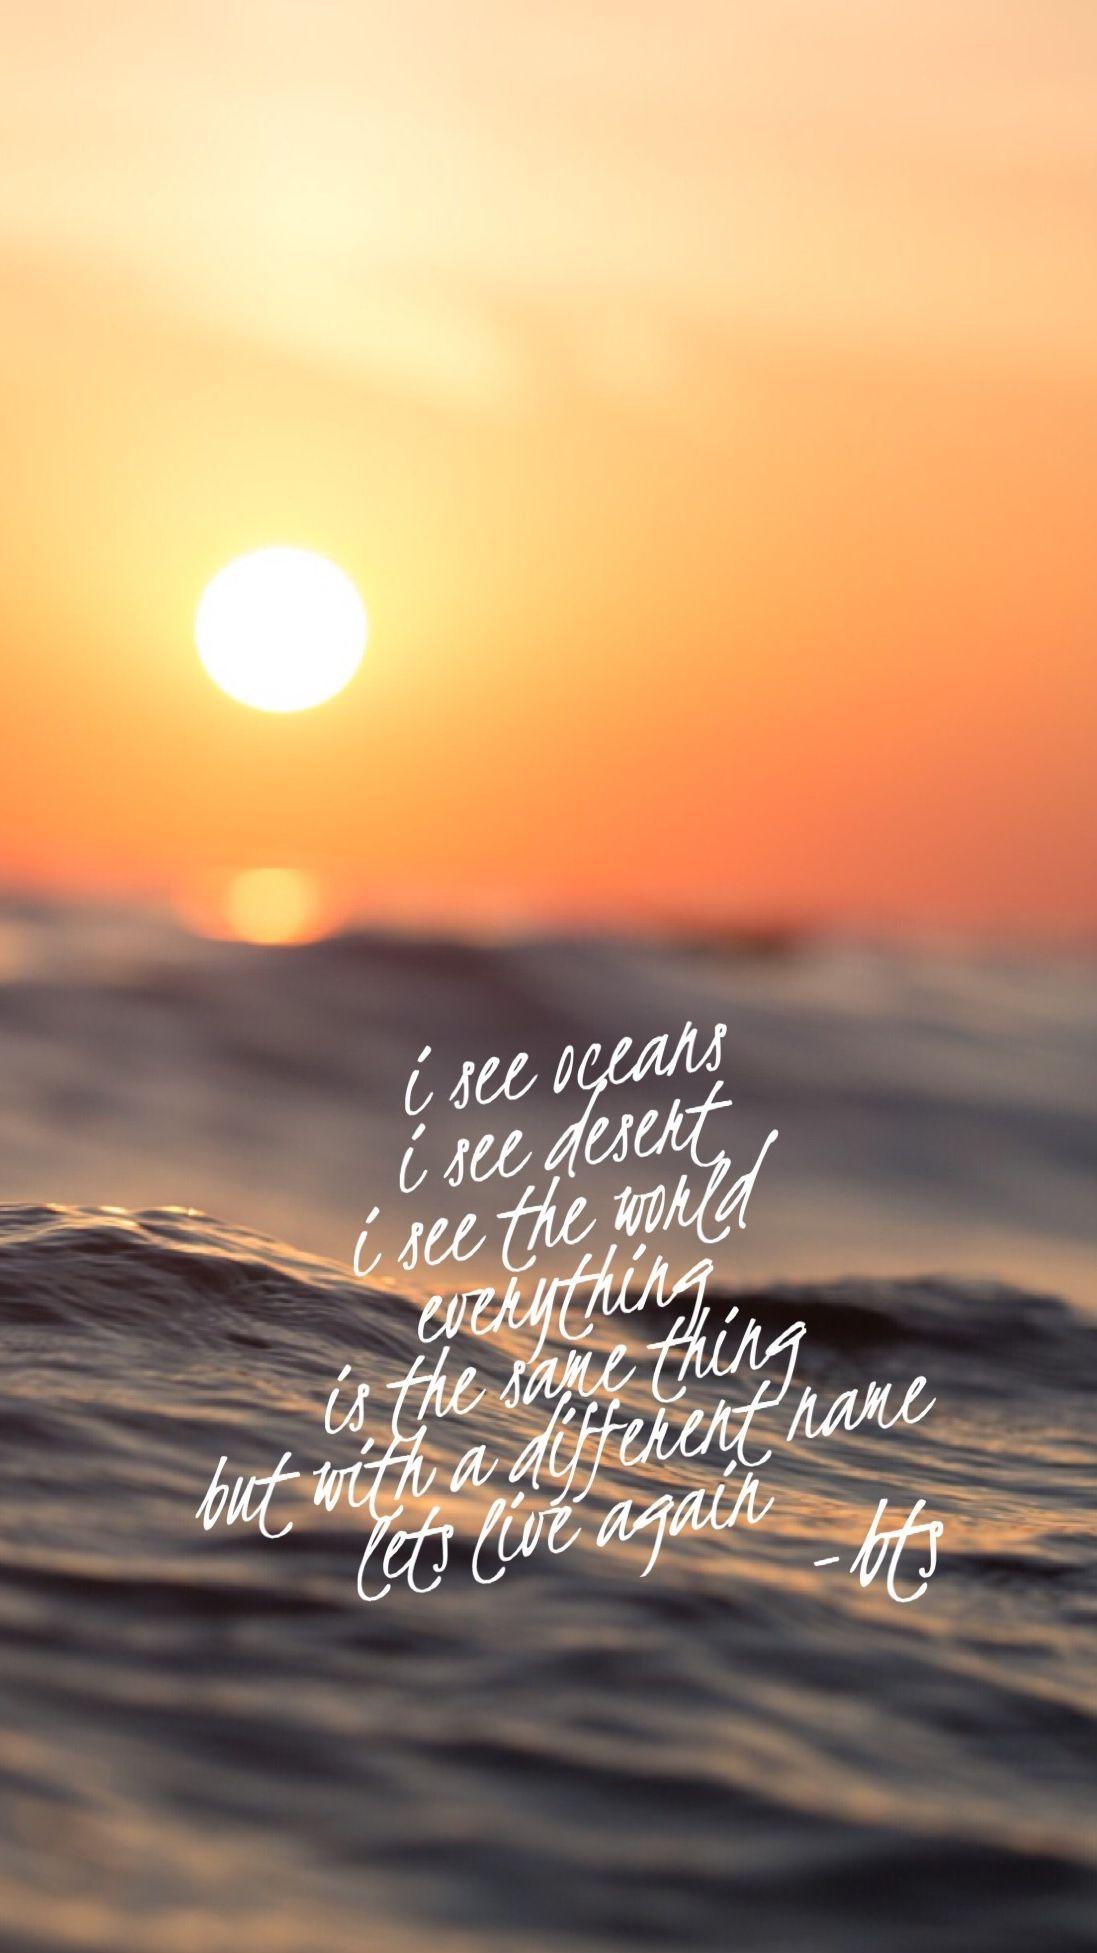 Bts Sea Lyrics 바다 Wallpaper Love Yourself Album Bangatn